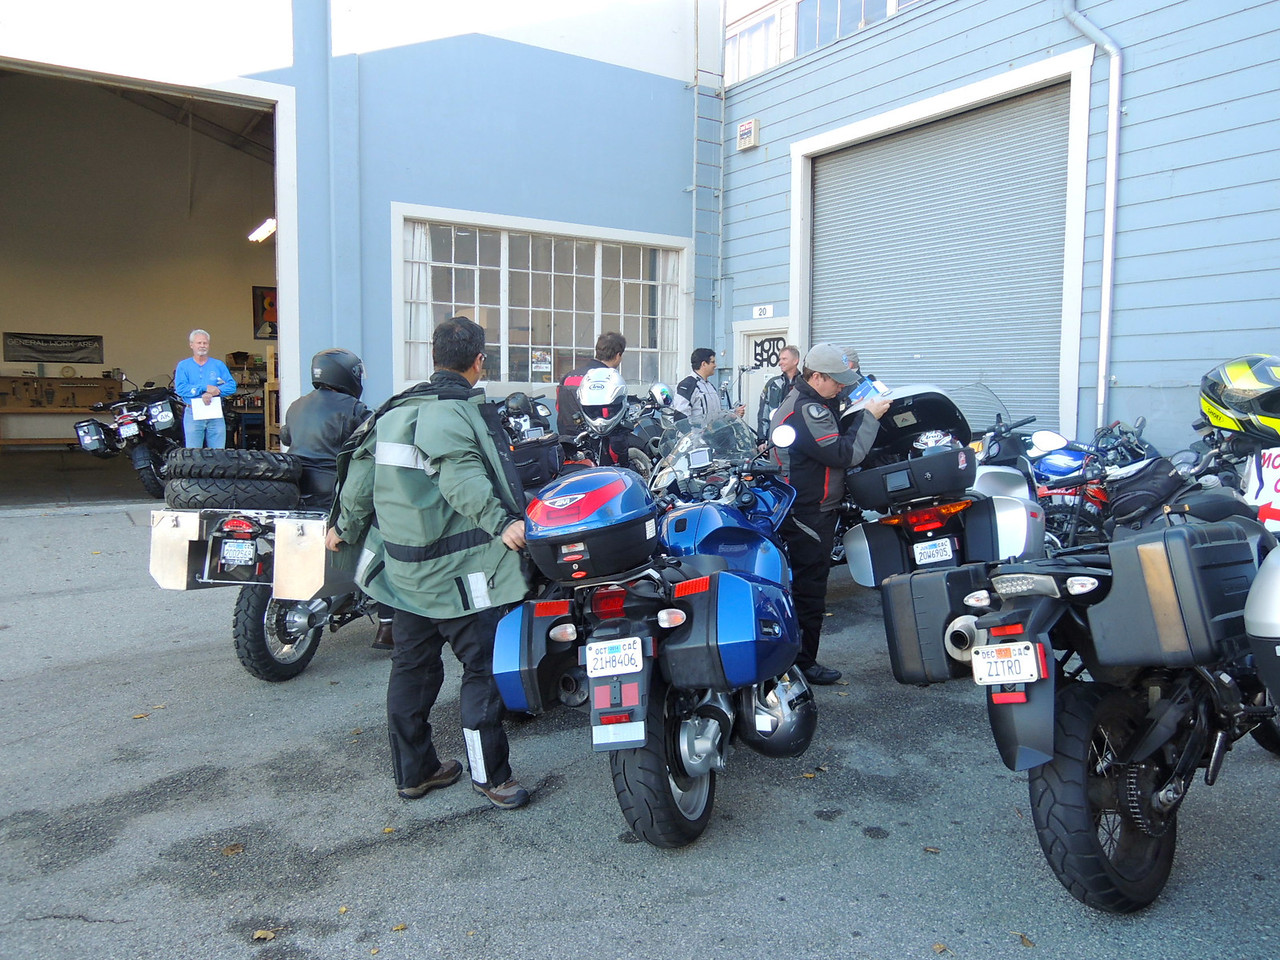 Norcal members arrive at Moto Shop.